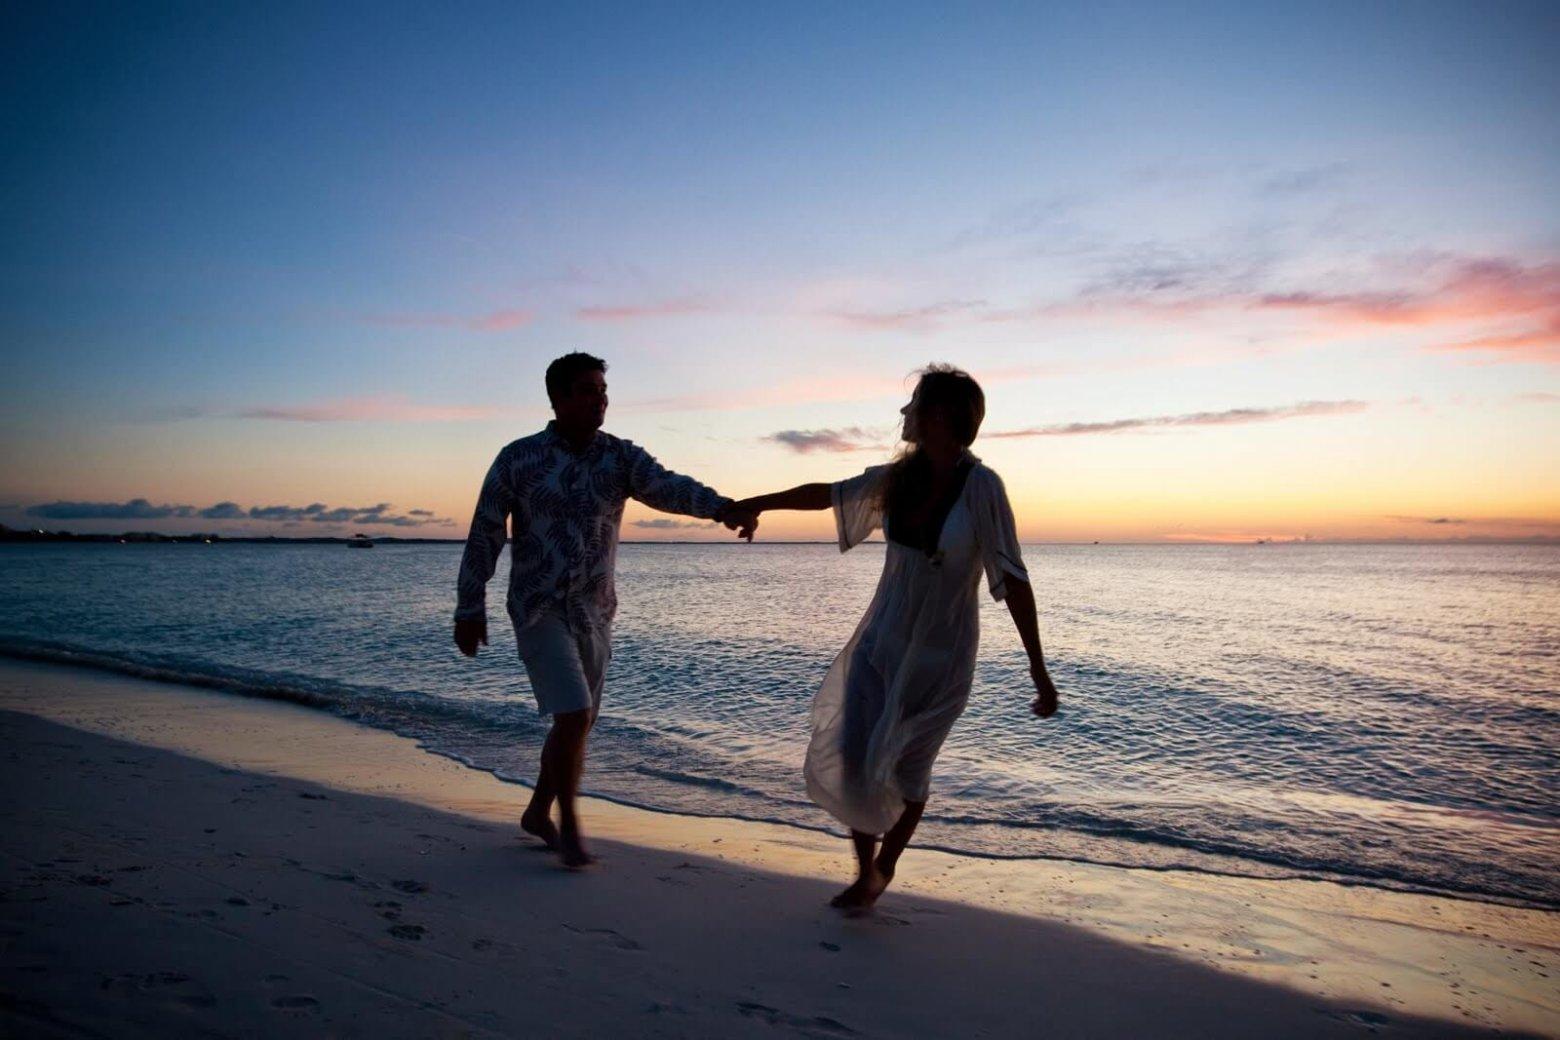 sunset speedboat tour with romantic beach dinner luxury